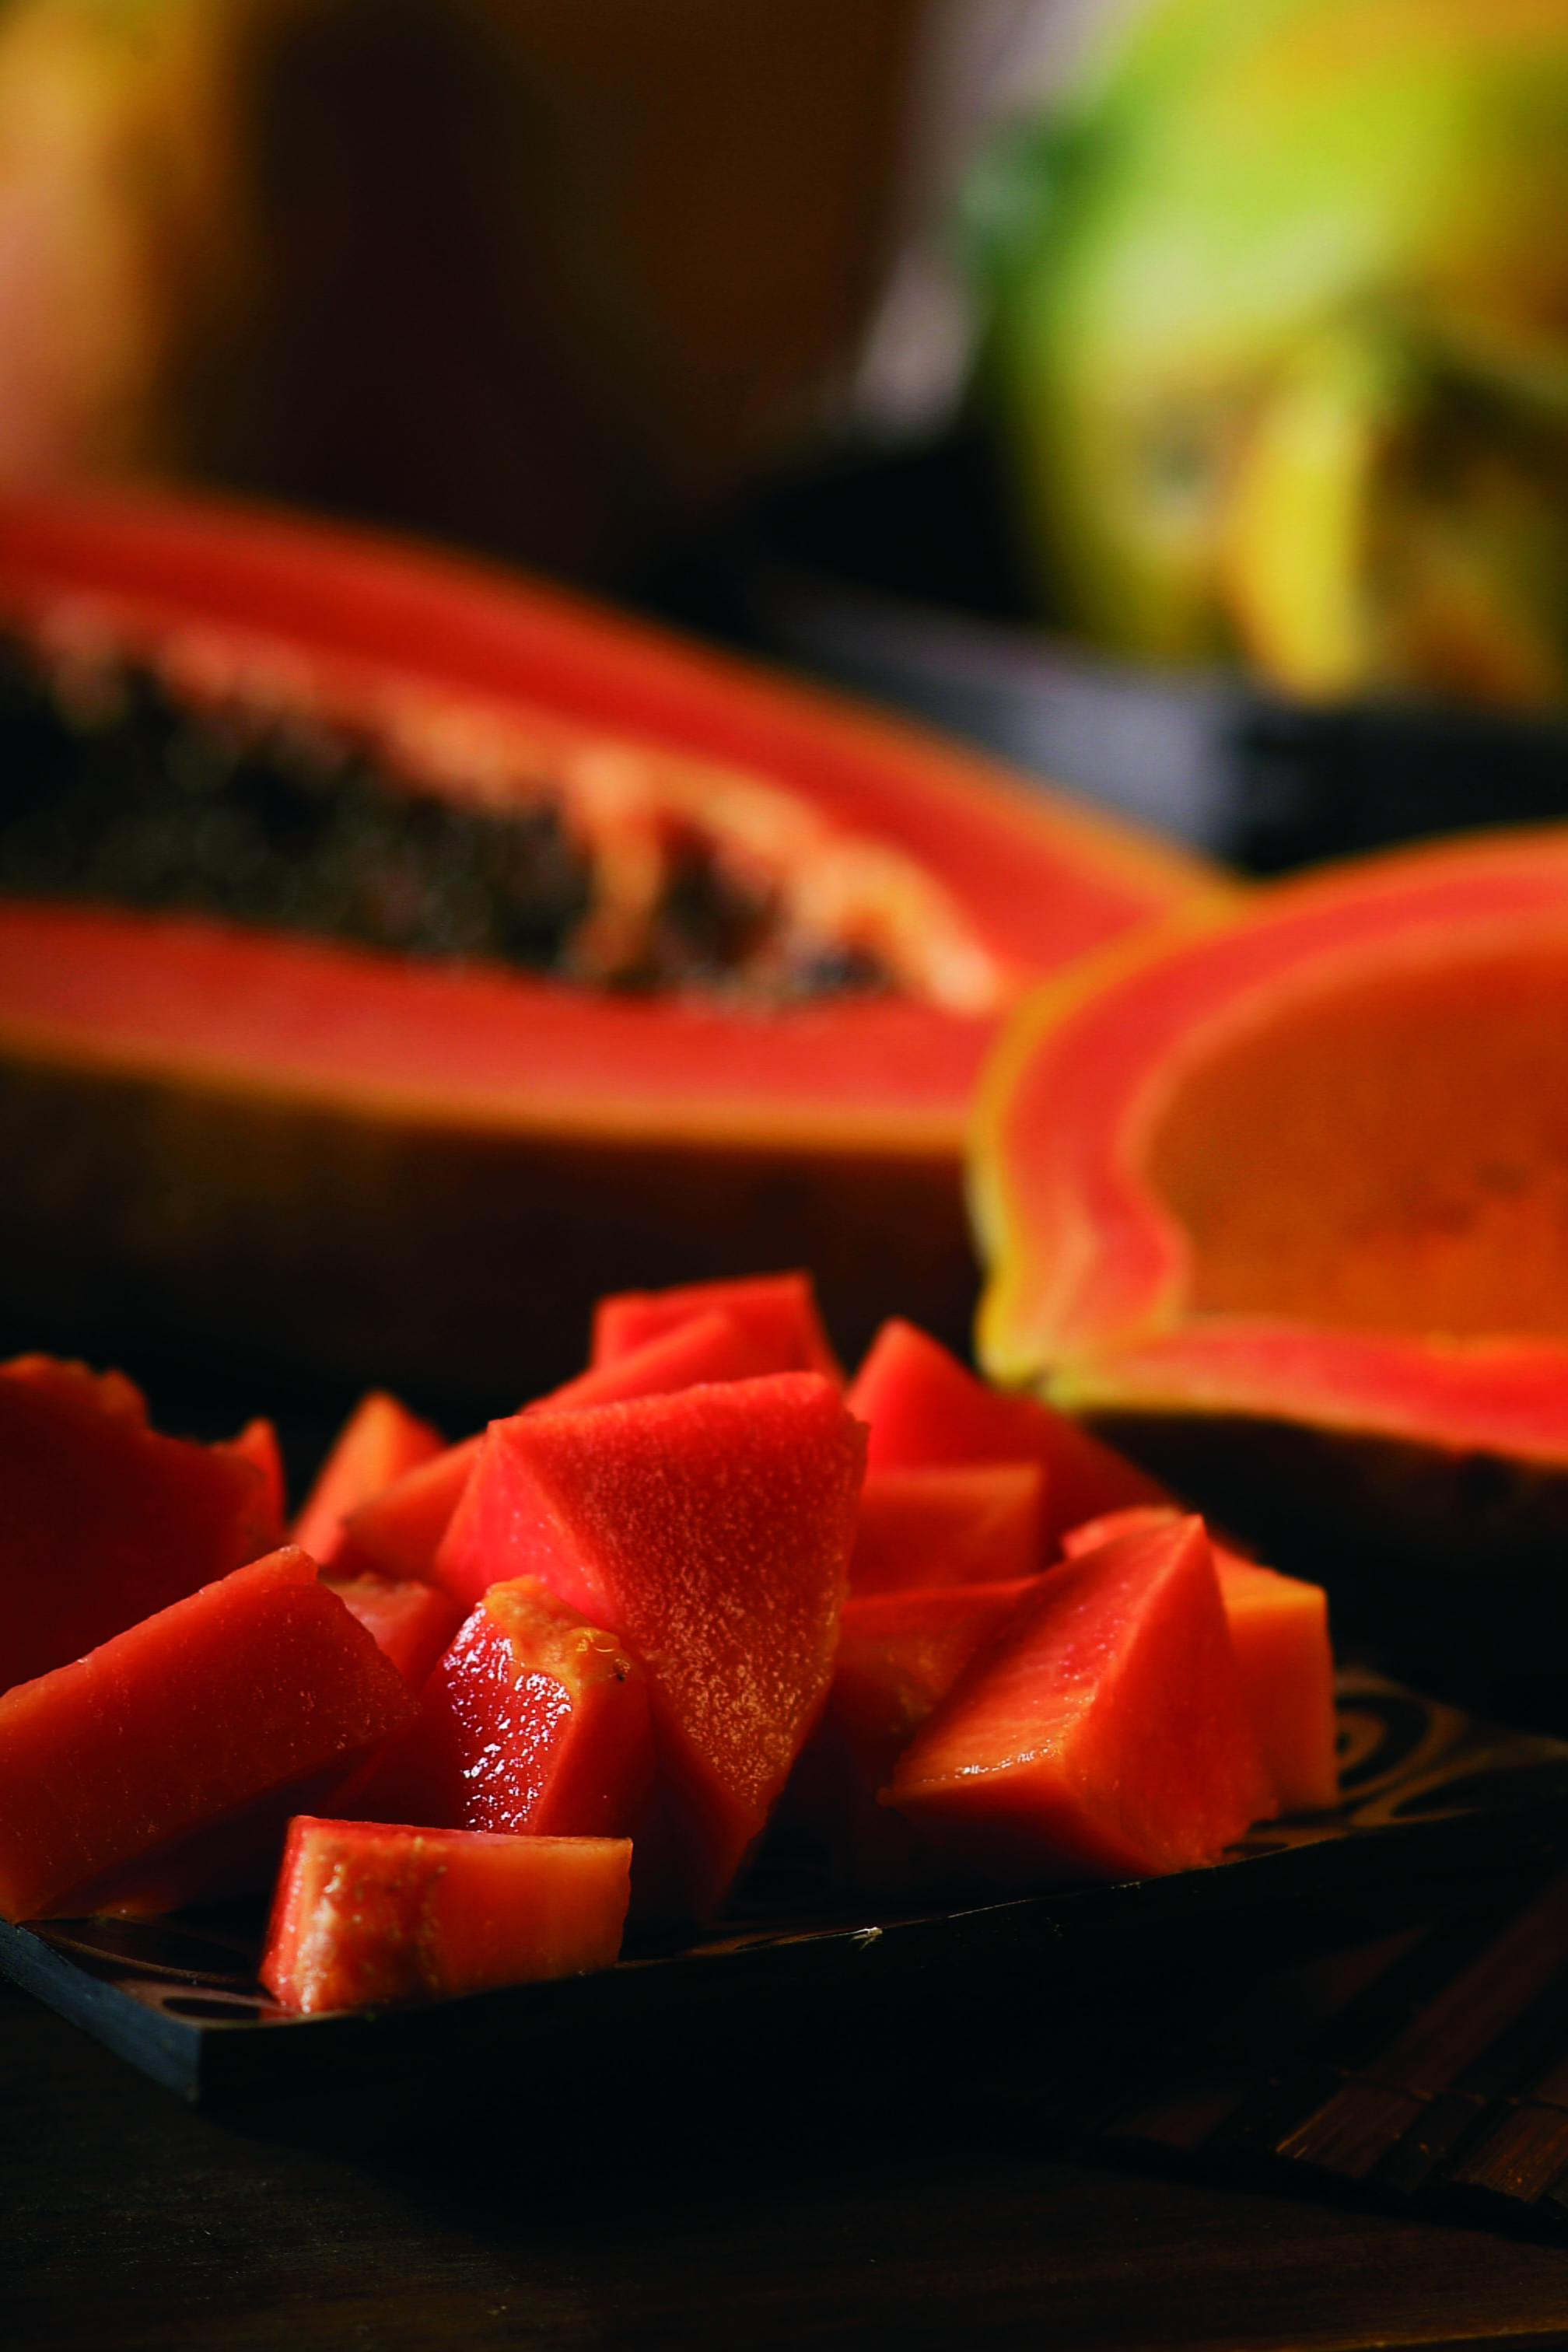 Papaya - Zucker